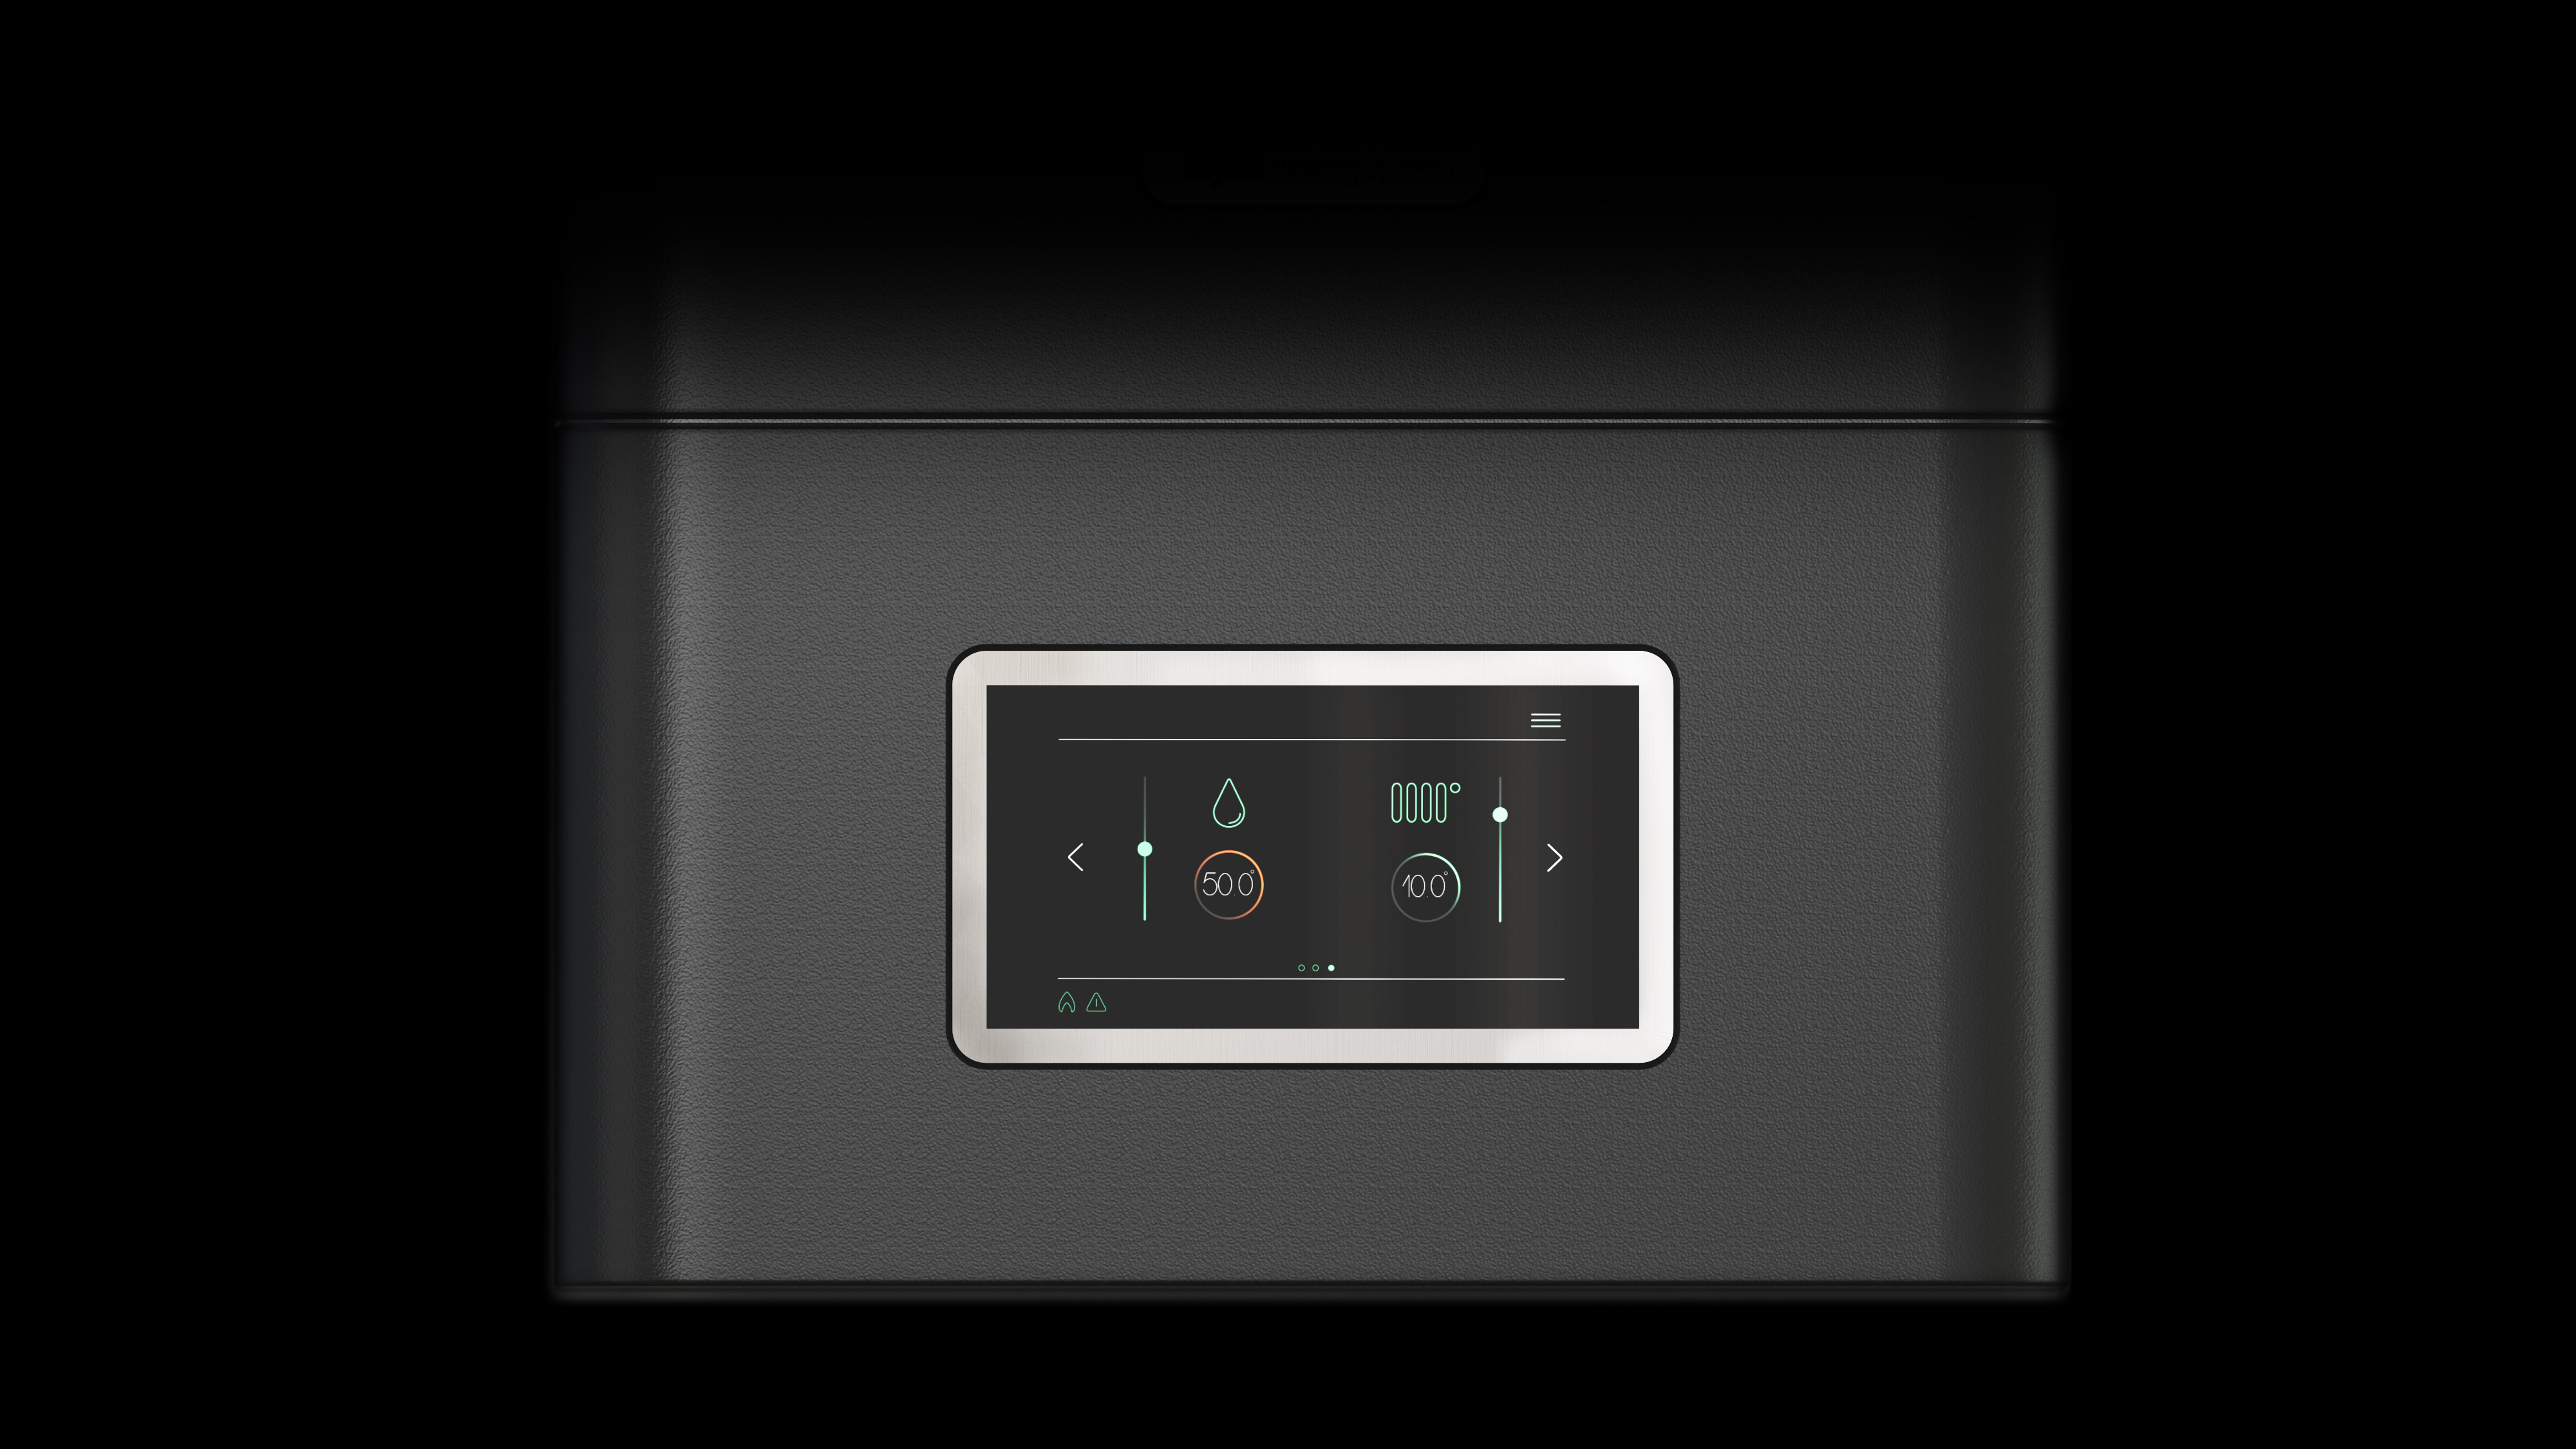 https://brightbirddesign.com/portfolio/eco-heating-systems-boilers/